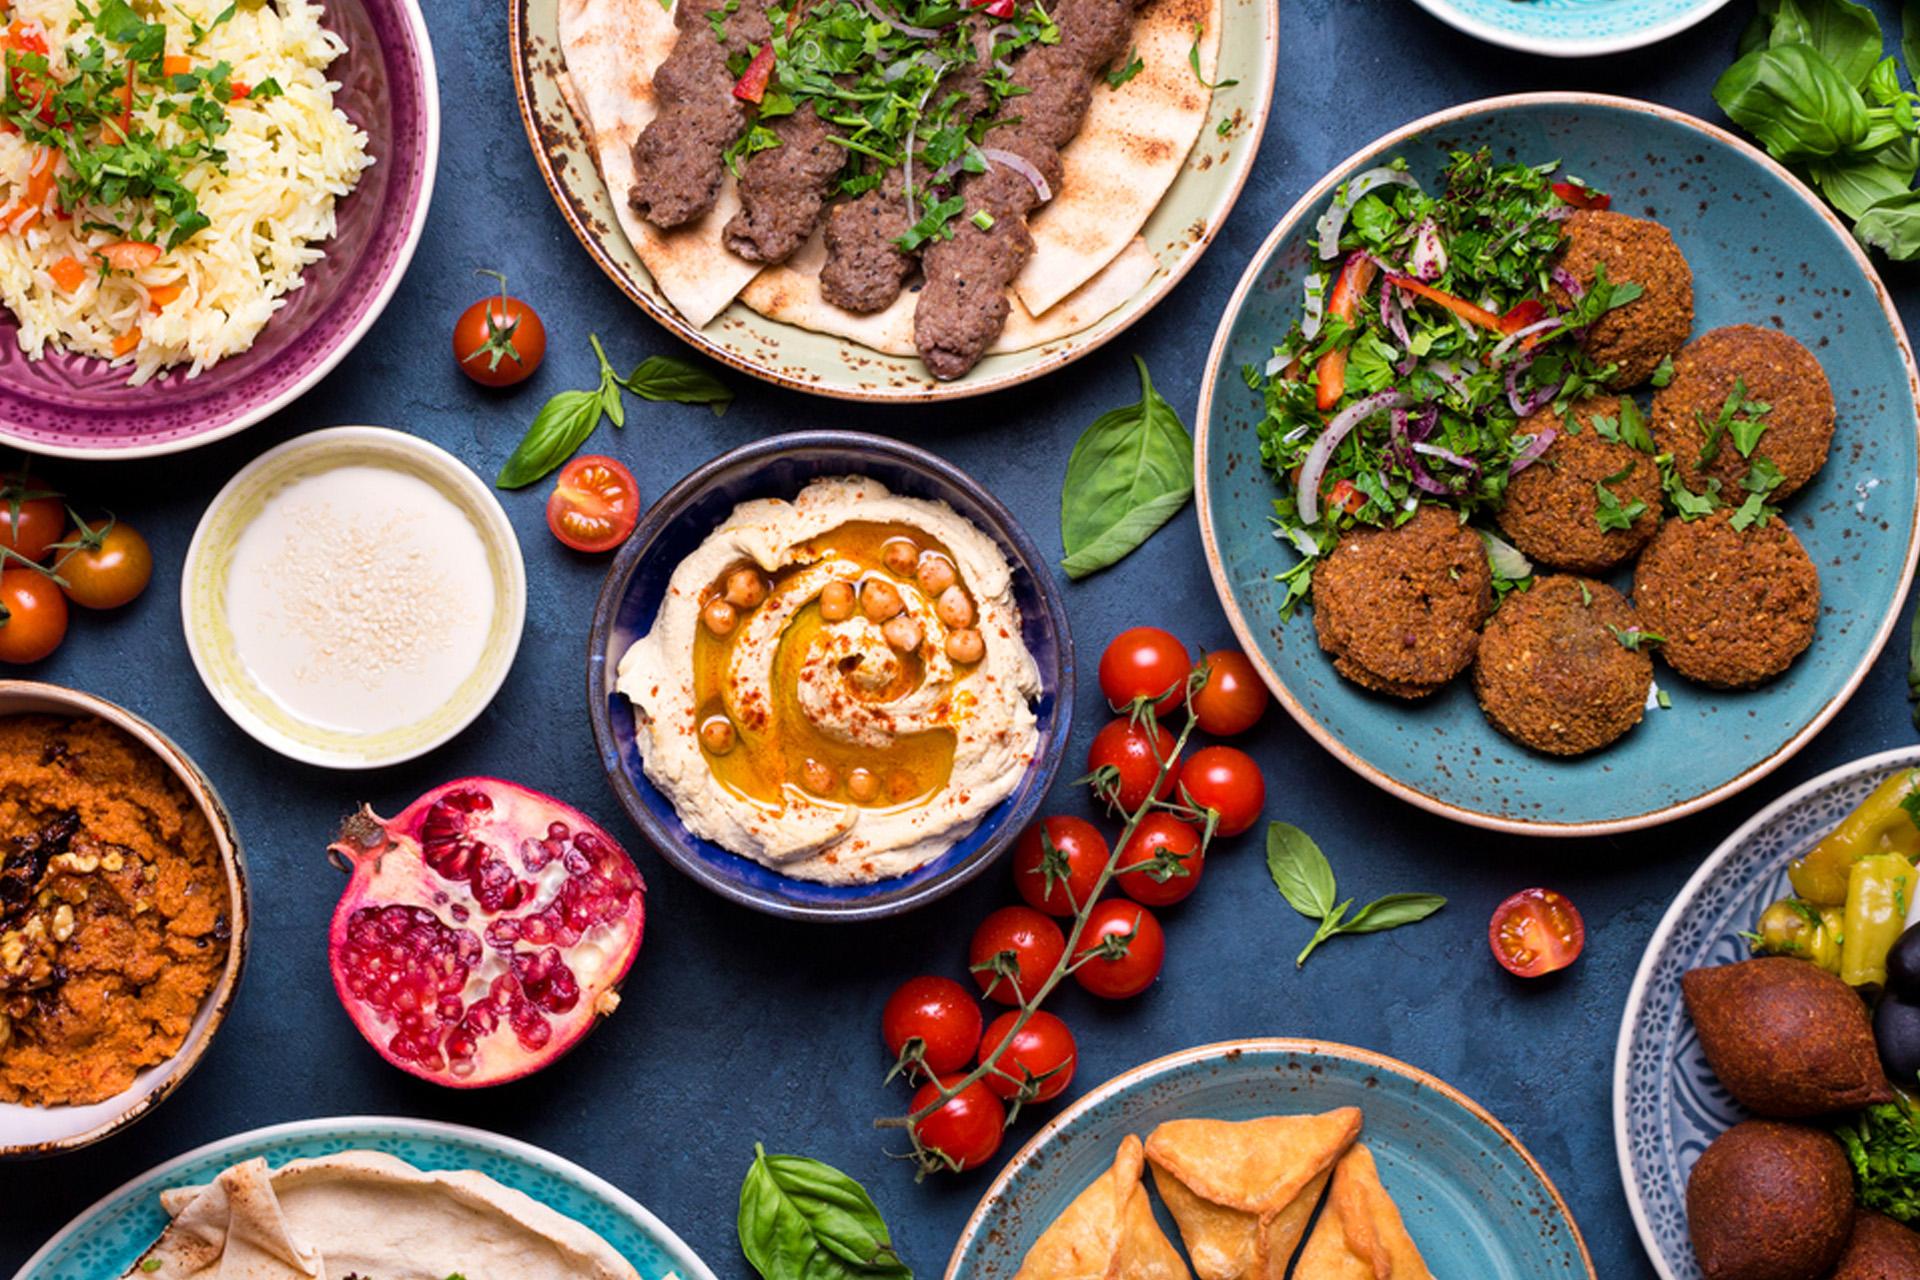 La comida en Emiratos Árabes